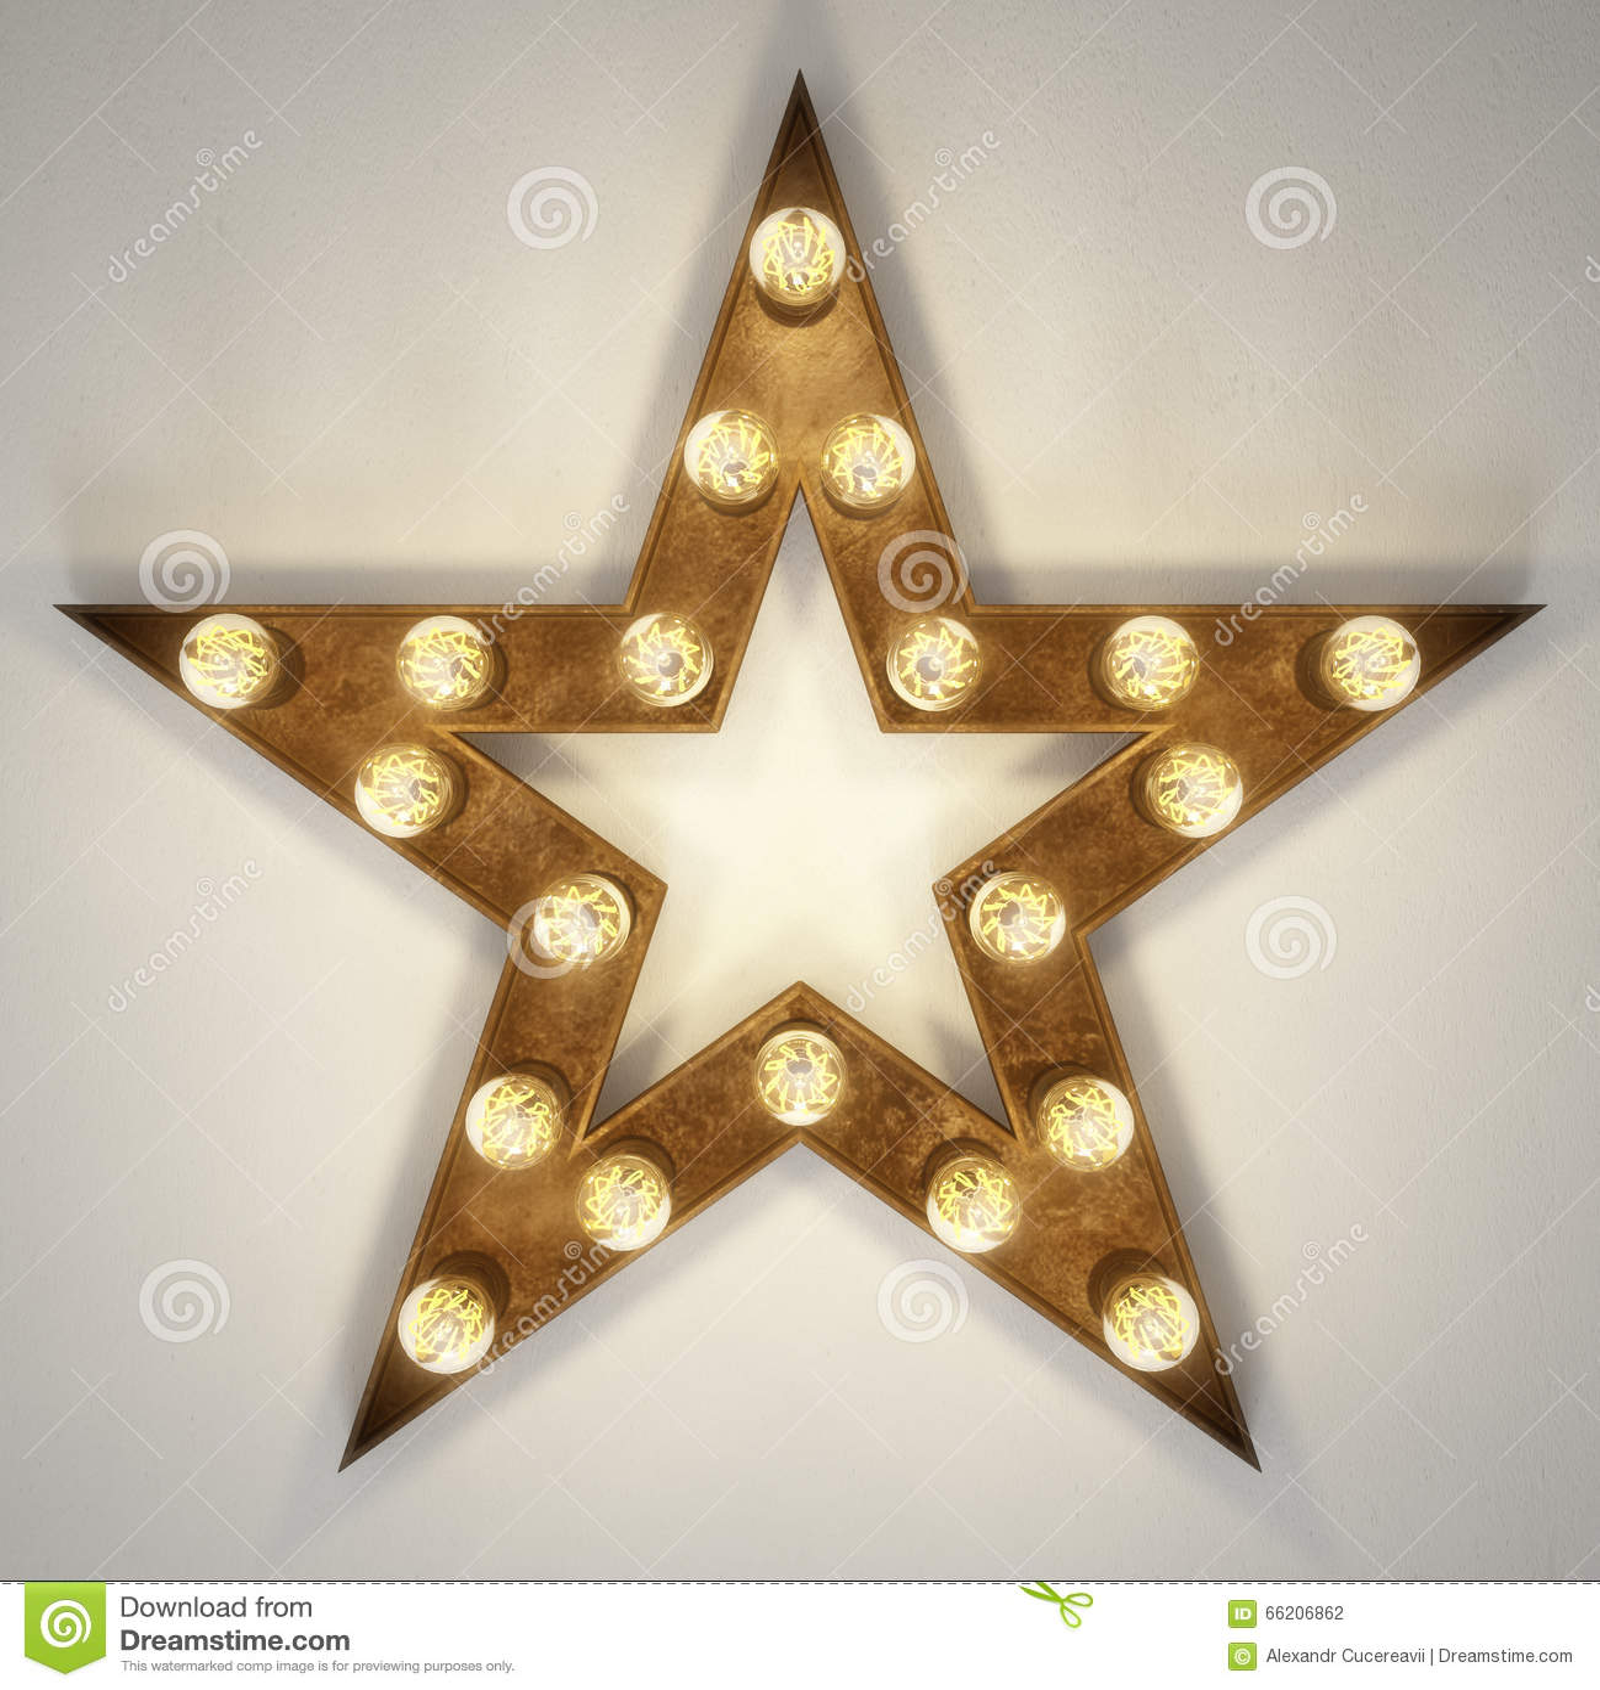 Star shaped light decor stock illustration illustration of bronze star shaped light decor kristyandbryce Images